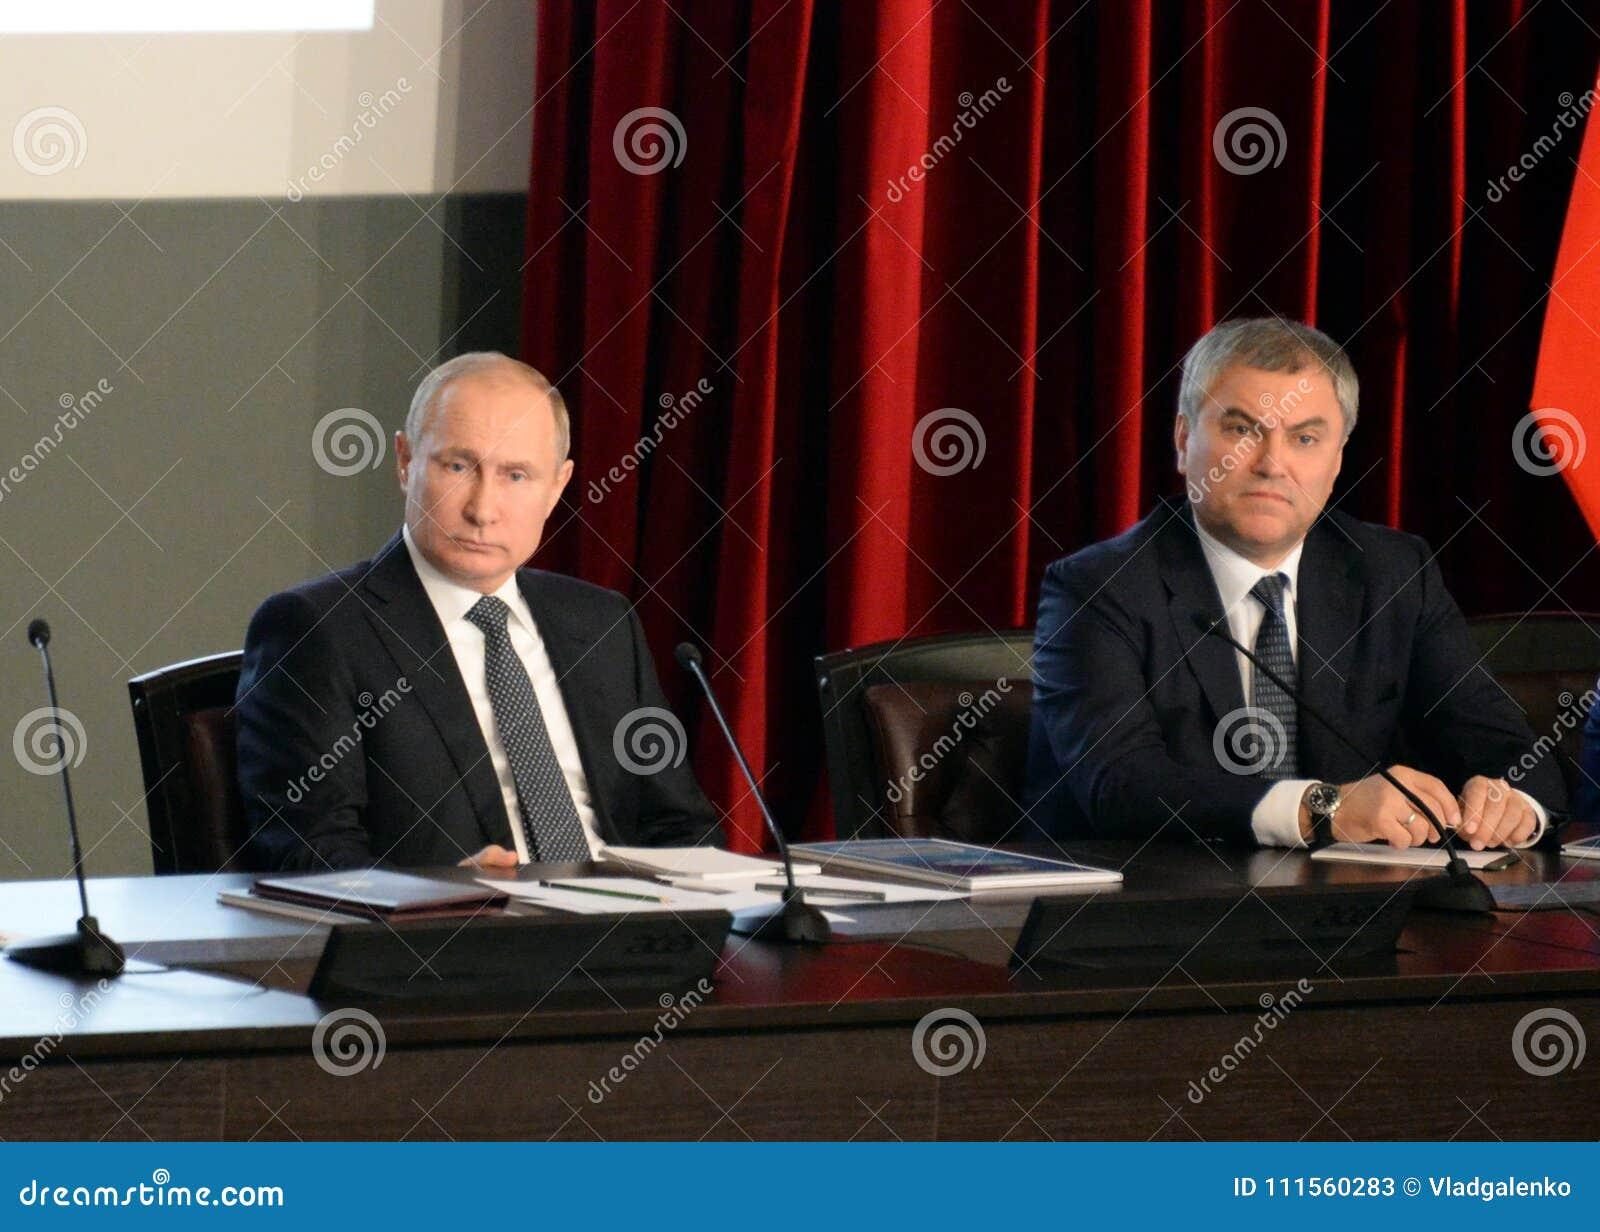 Vladimir Putin, President of the Russian Federation 71